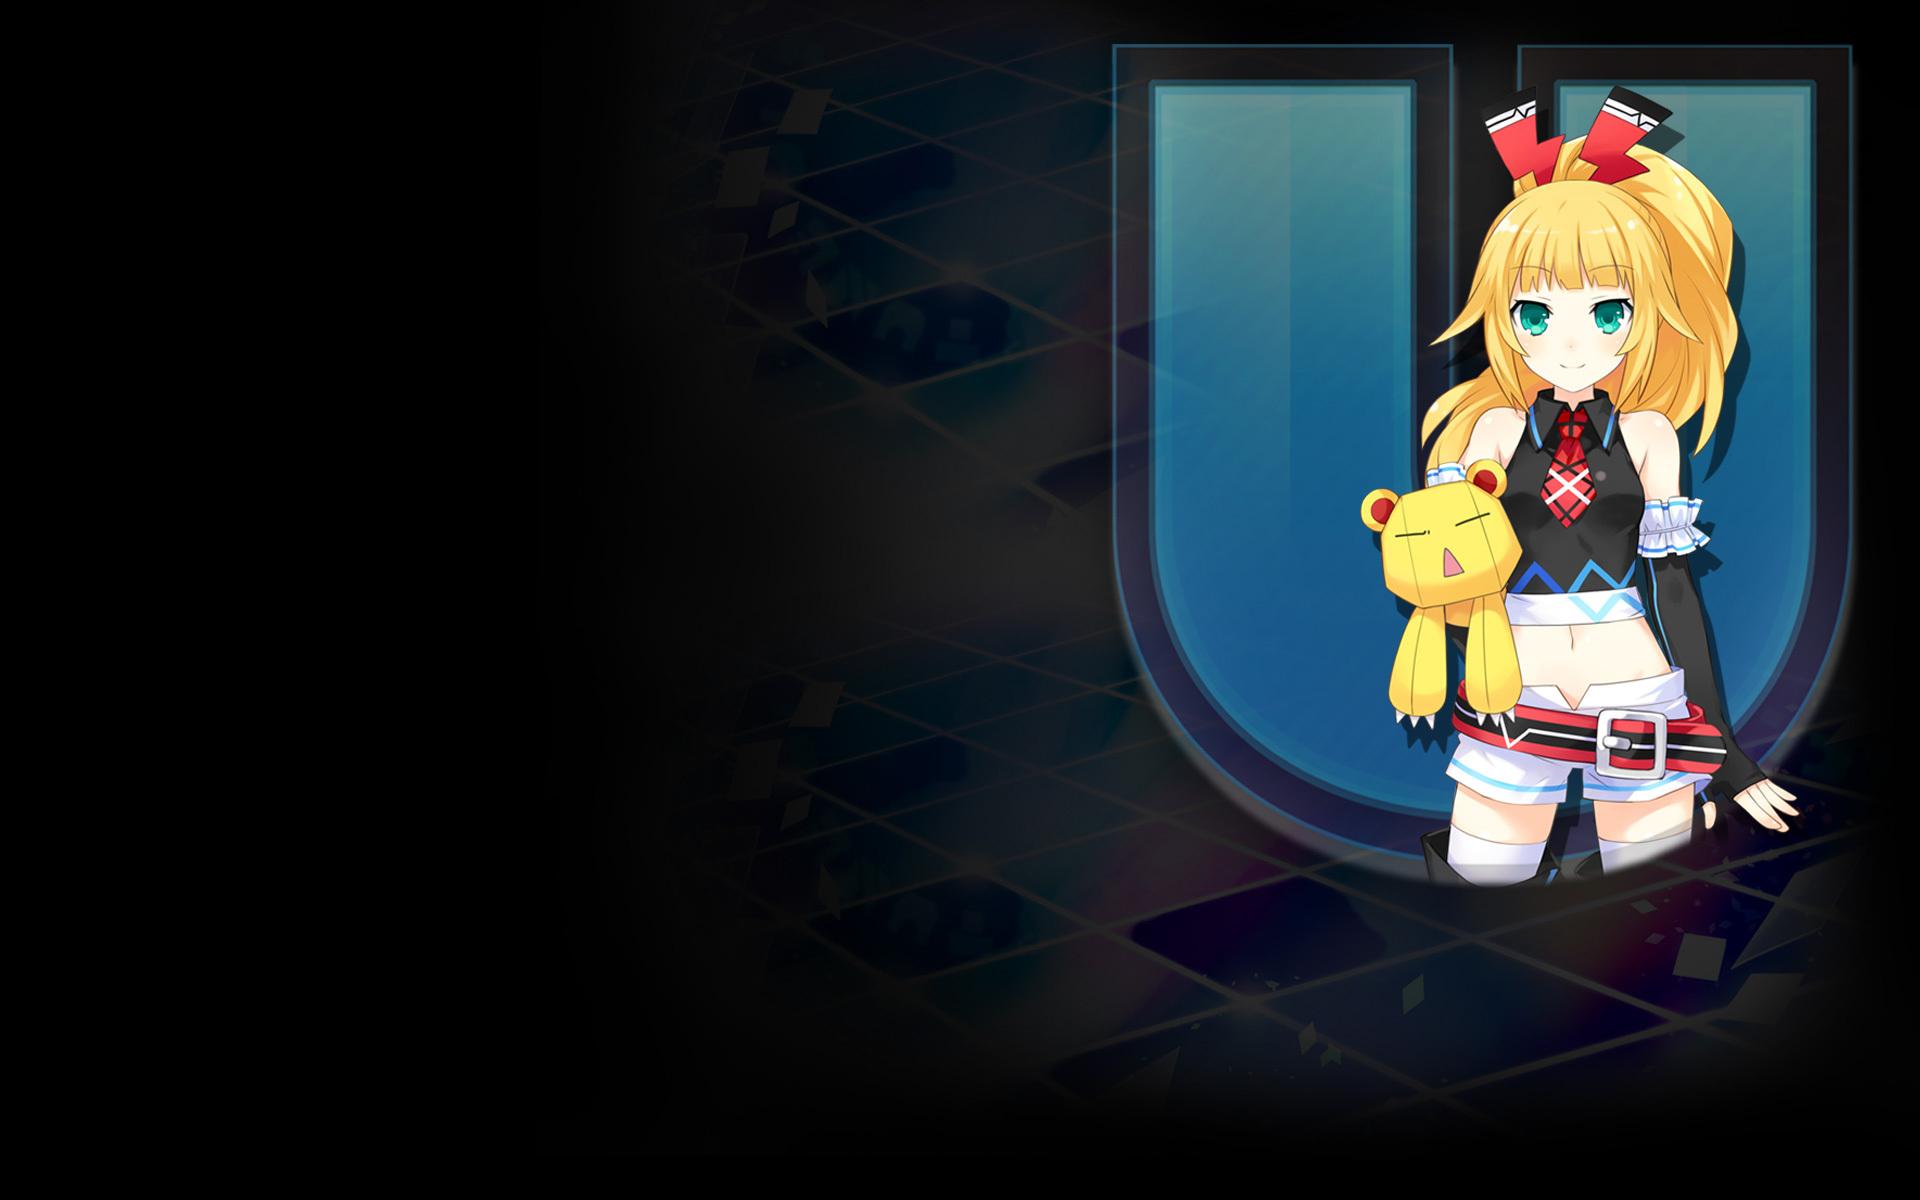 Hyperdimension Neptunia U: Action Unleashed Wallpaper 013 – Dengekiko BG